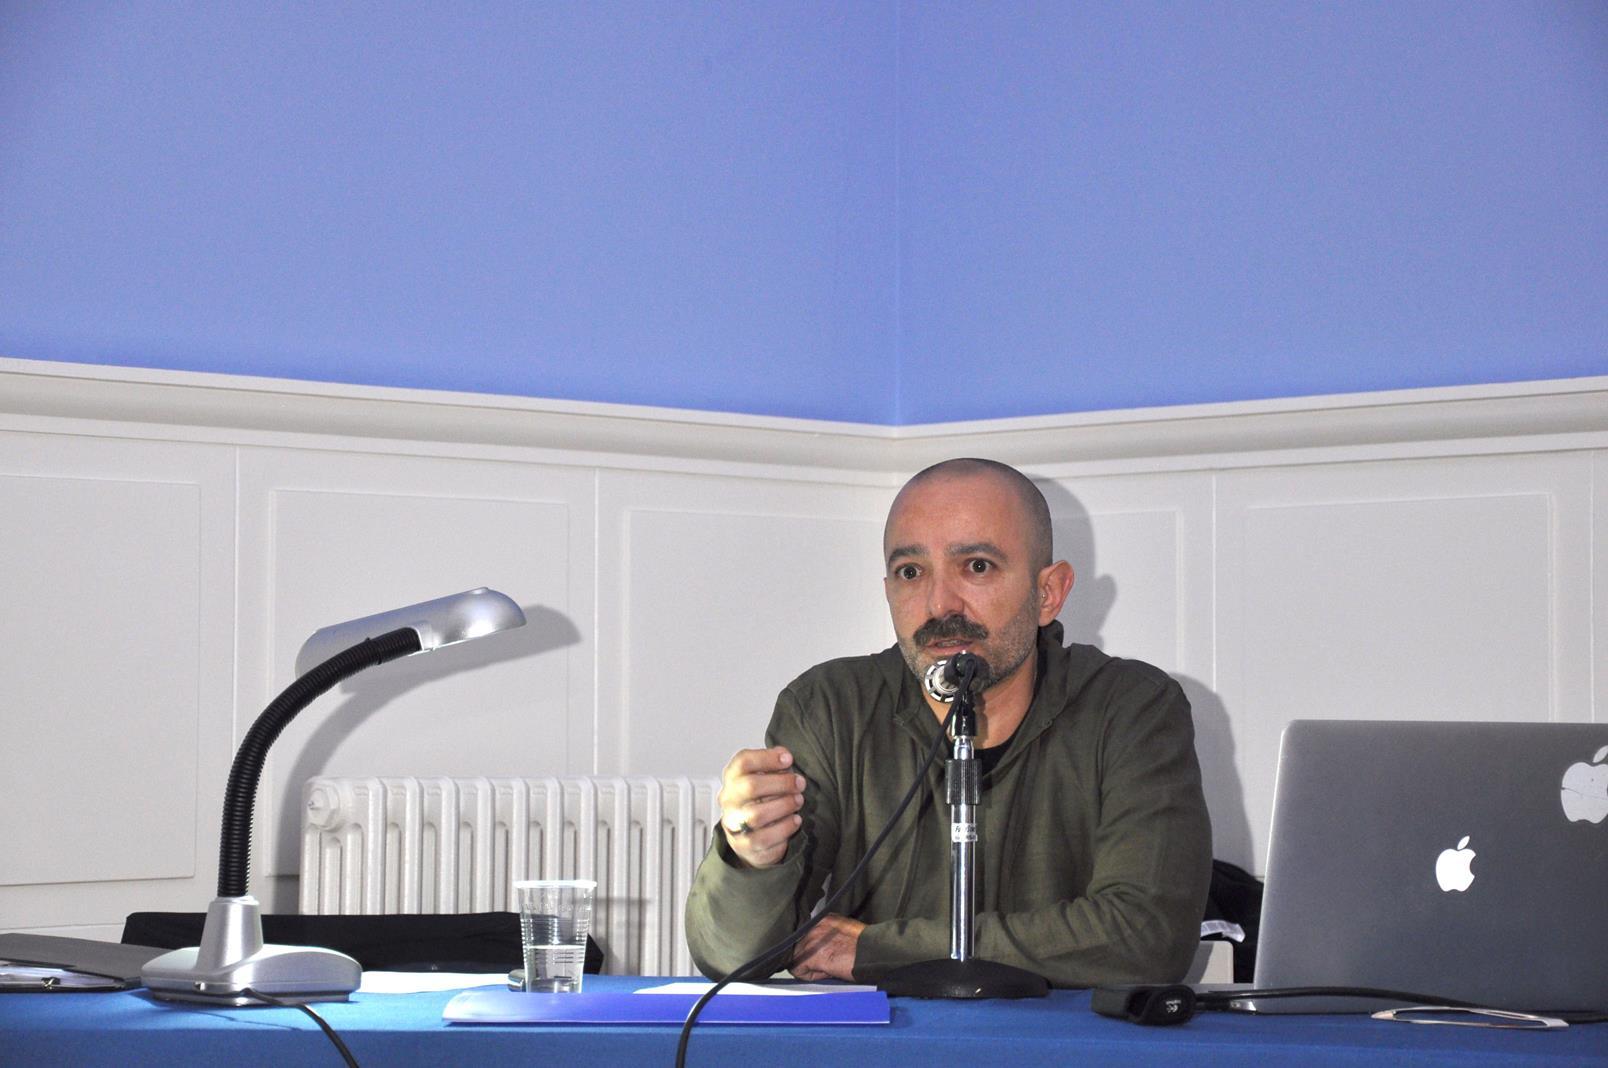 Pablo Martínez Muñiz. Fotógrafo, Madrid. 23/10/19